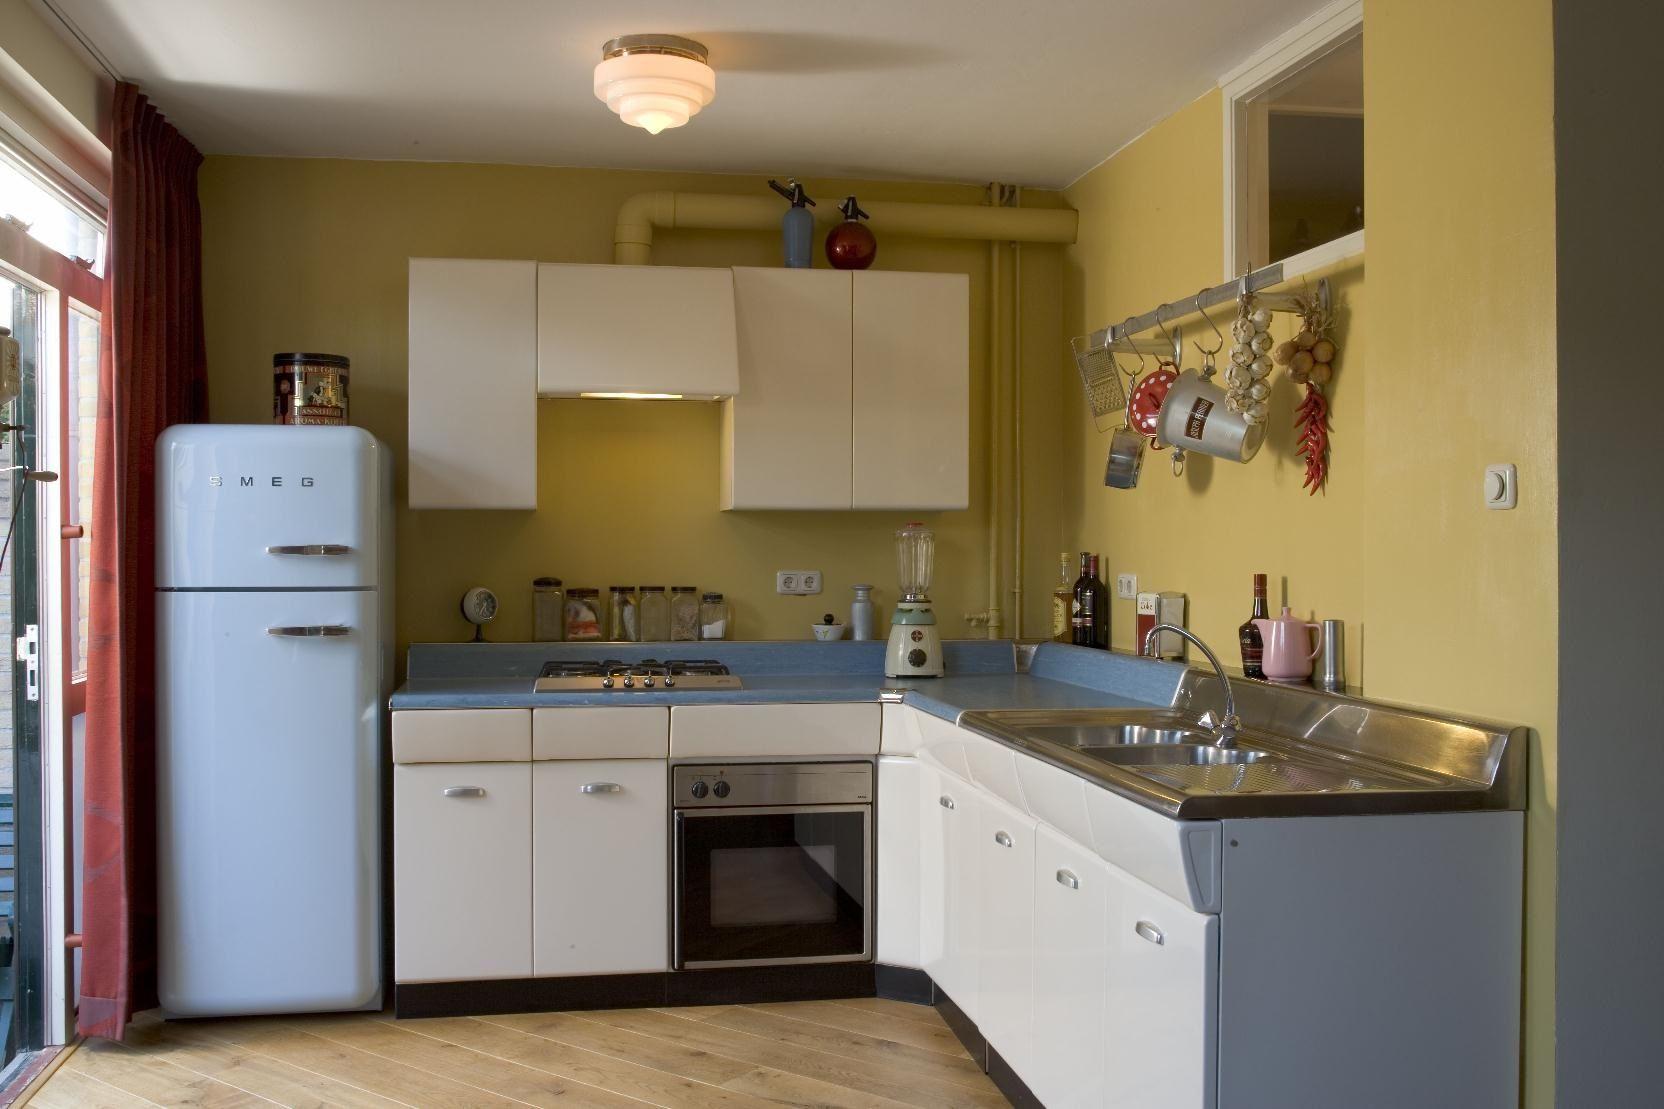 Retro Smeg Koelkast : Retro keuken idfix bcl met smeg koelkast american kitchens